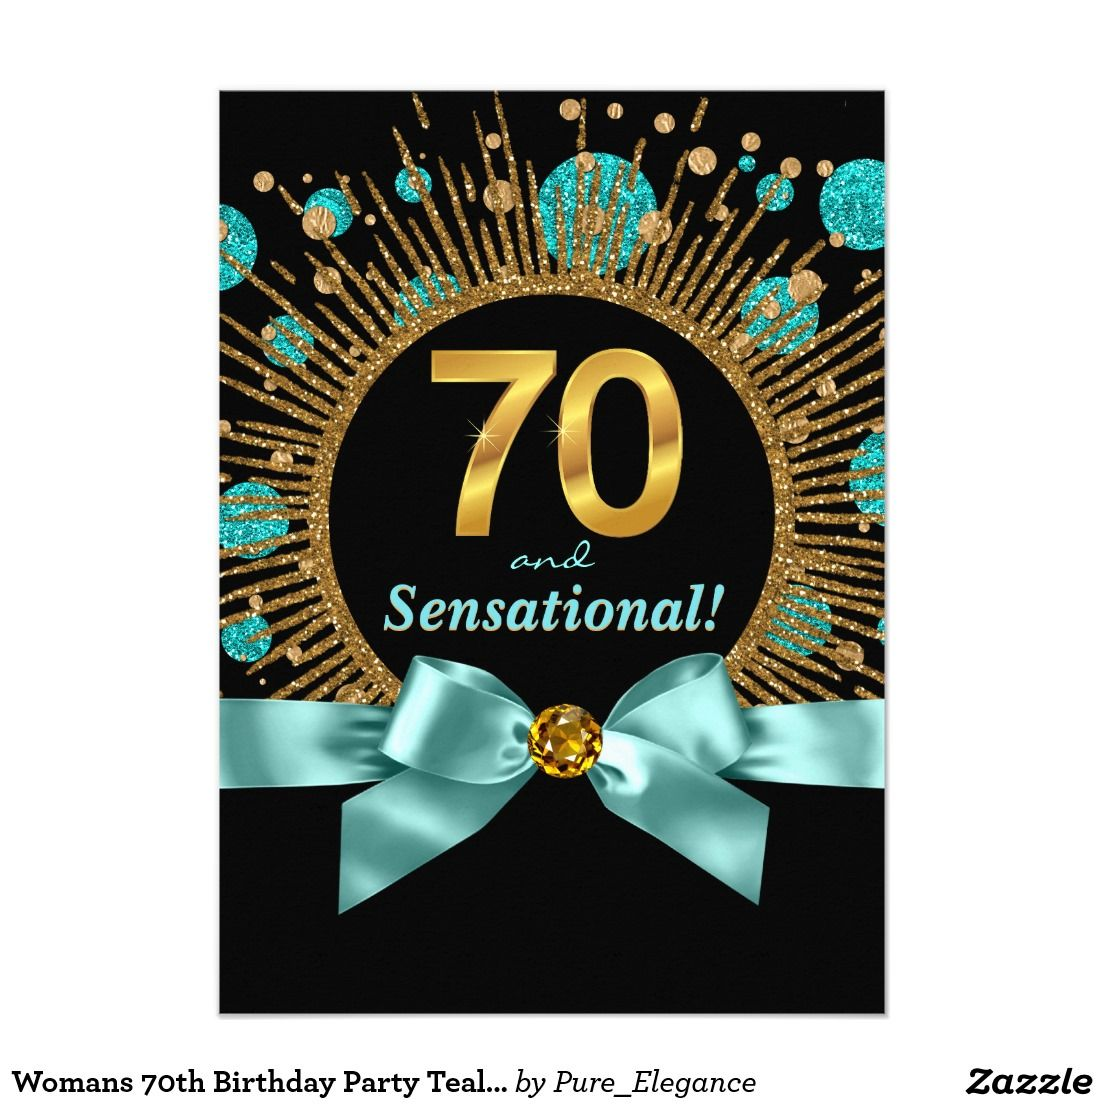 Indulging G Card 70th Birthday Party Ideas Nz 70th Birthday Party Ideas Mum Birthday Party Ideas Womans Birthday Party Blue